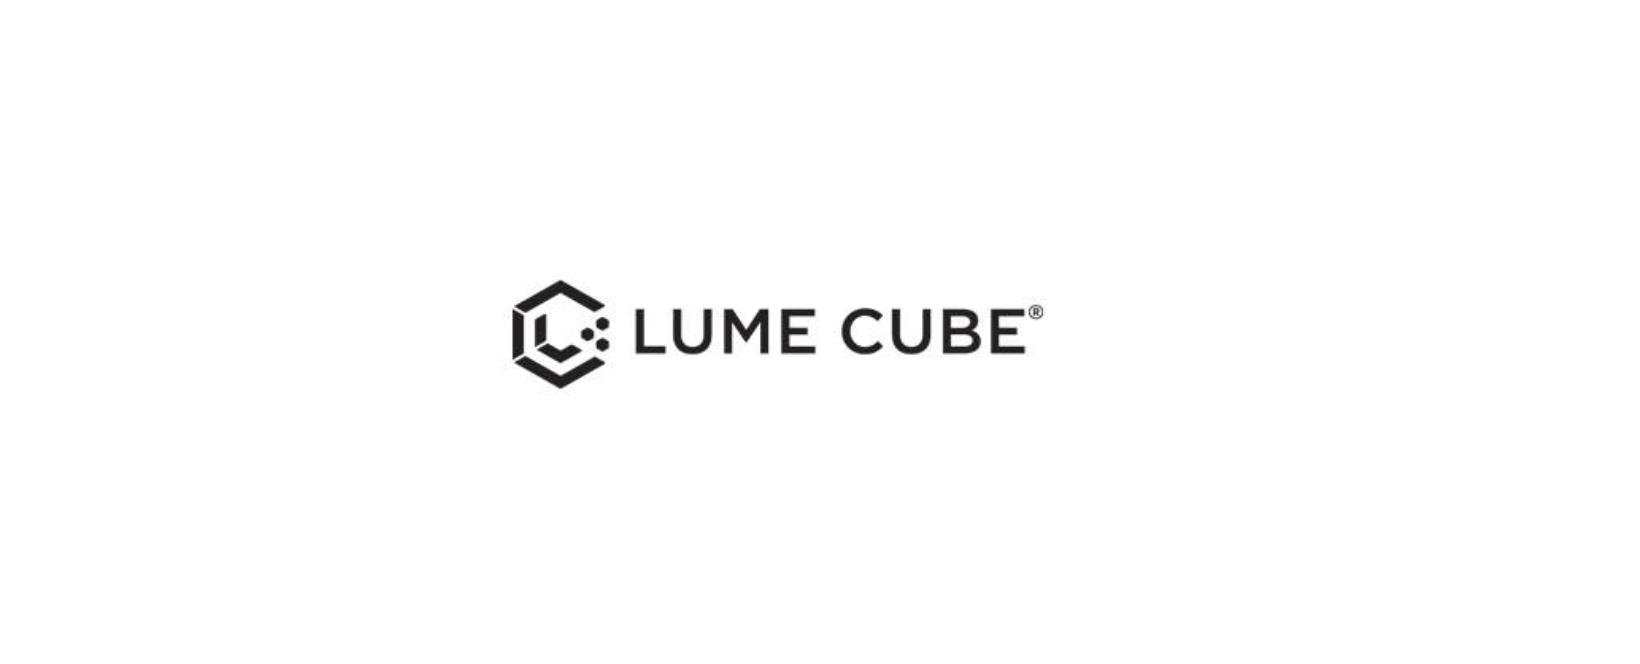 Lume Cube Discount Code 2021